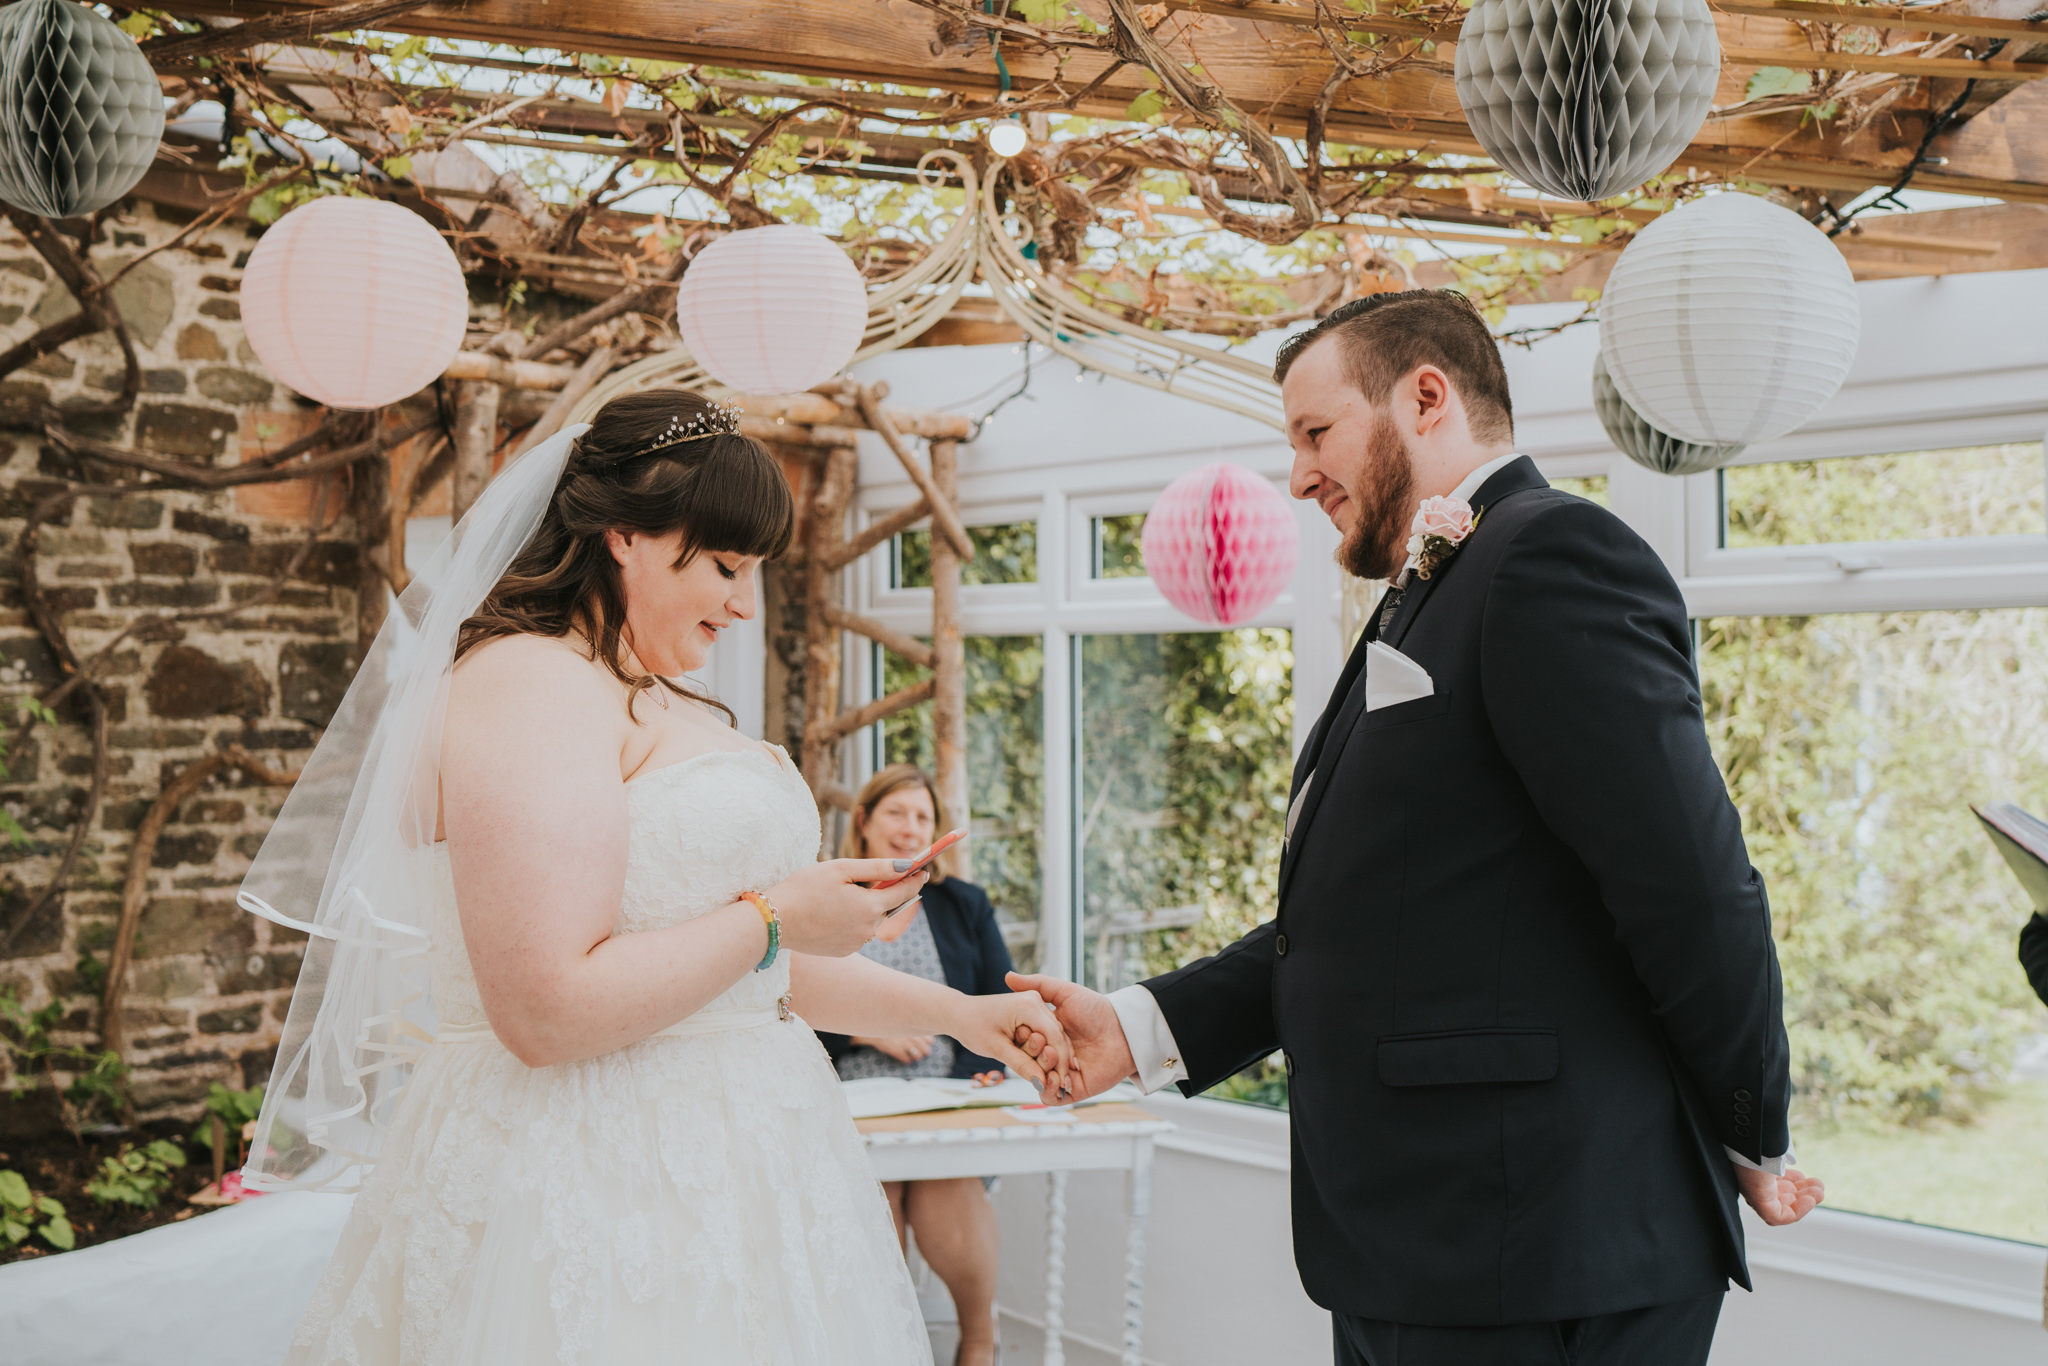 grace-sam-old-barn-clovelly-devon-wedding-photographer-grace-elizabeth-essex-suffolk-norfolk-wedding-photographer (60 of 132).jpg